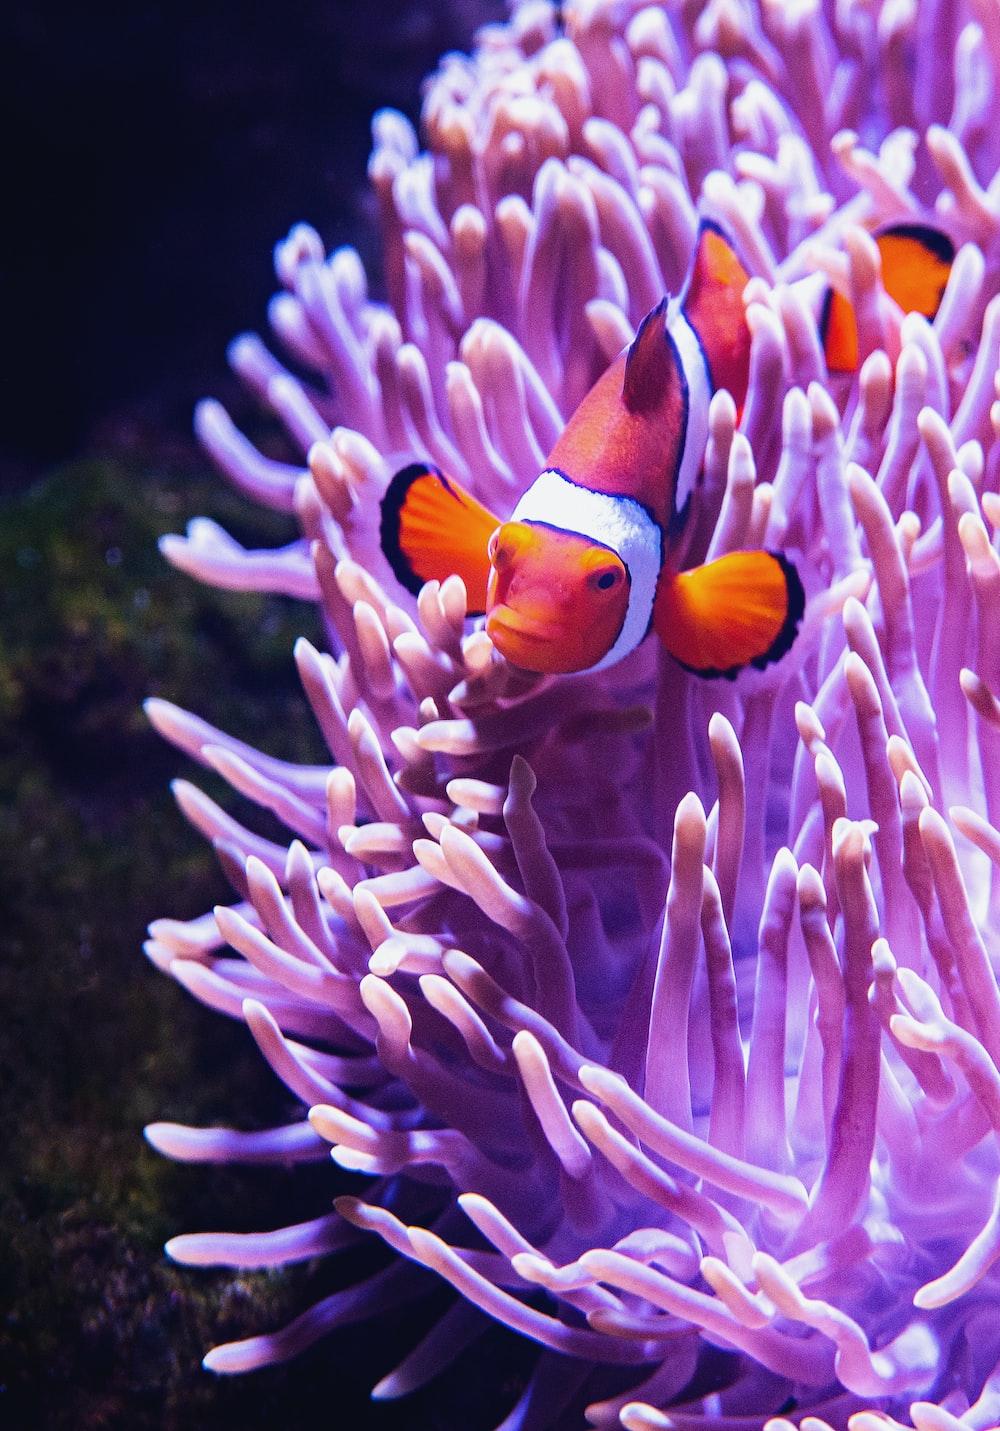 close-up photography of clownfish beside purple coral rift